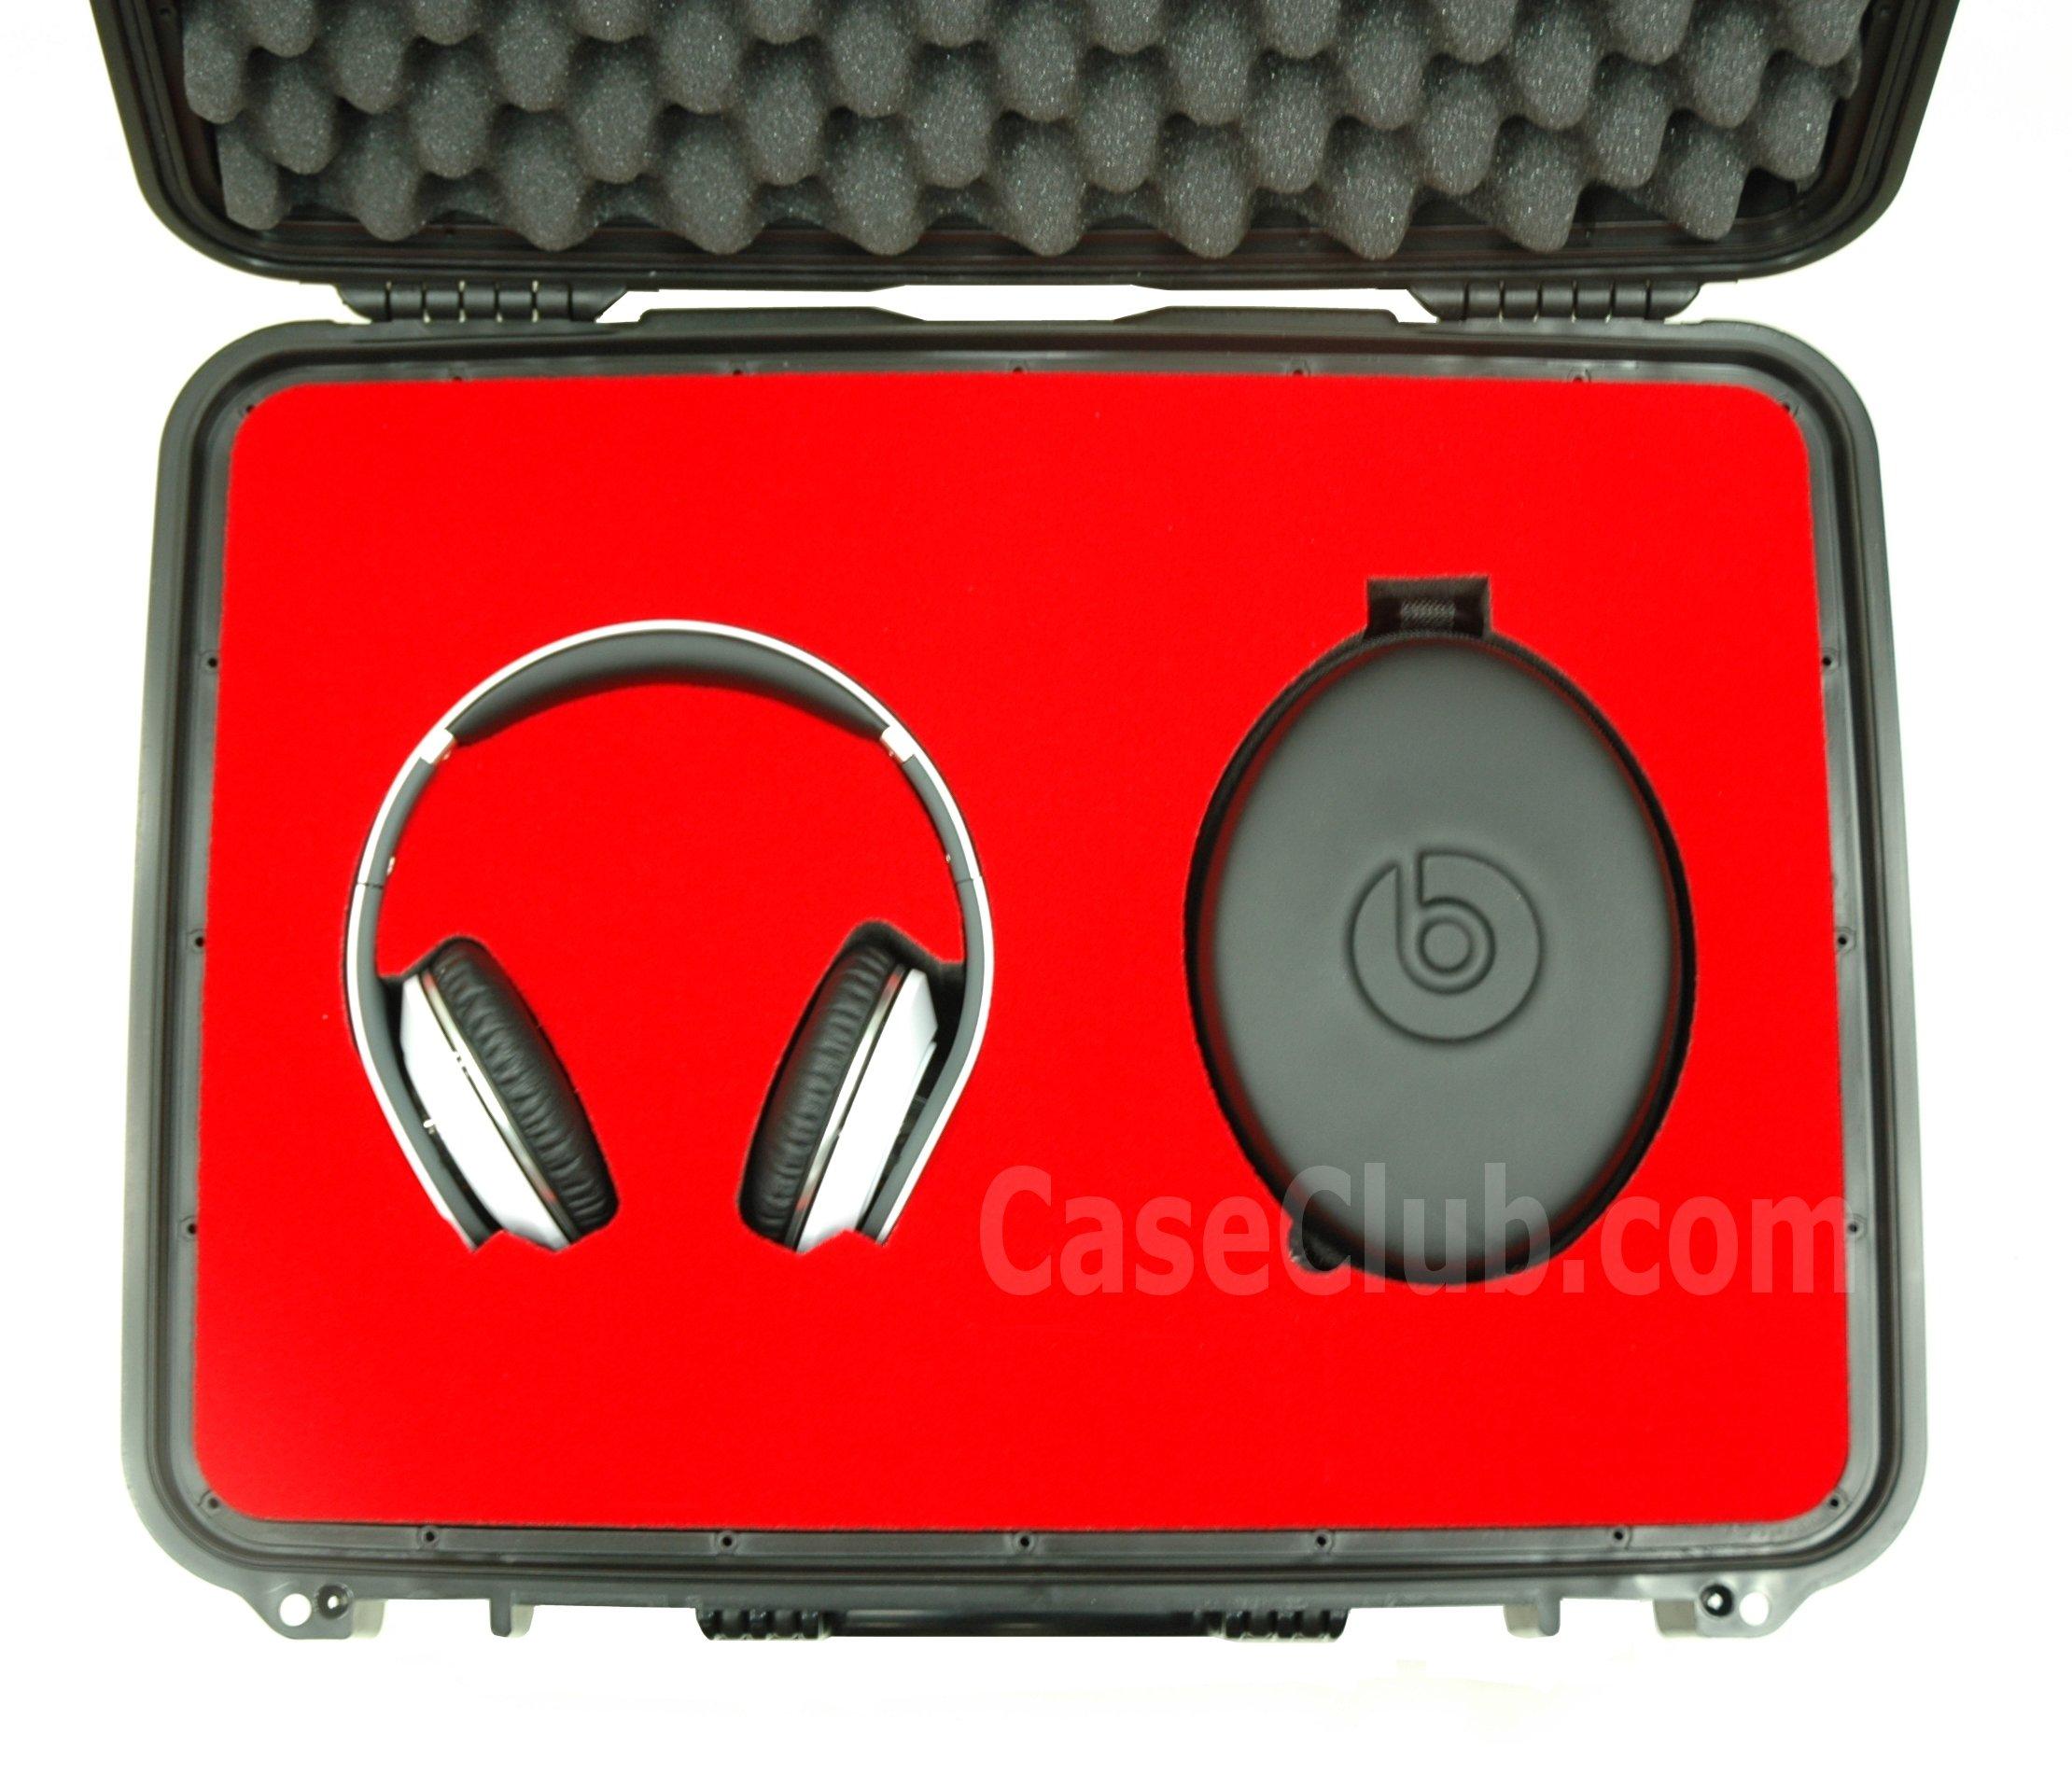 Case Club CC720SE Case Custom Foam Example: Beats By Dre Headphone Case